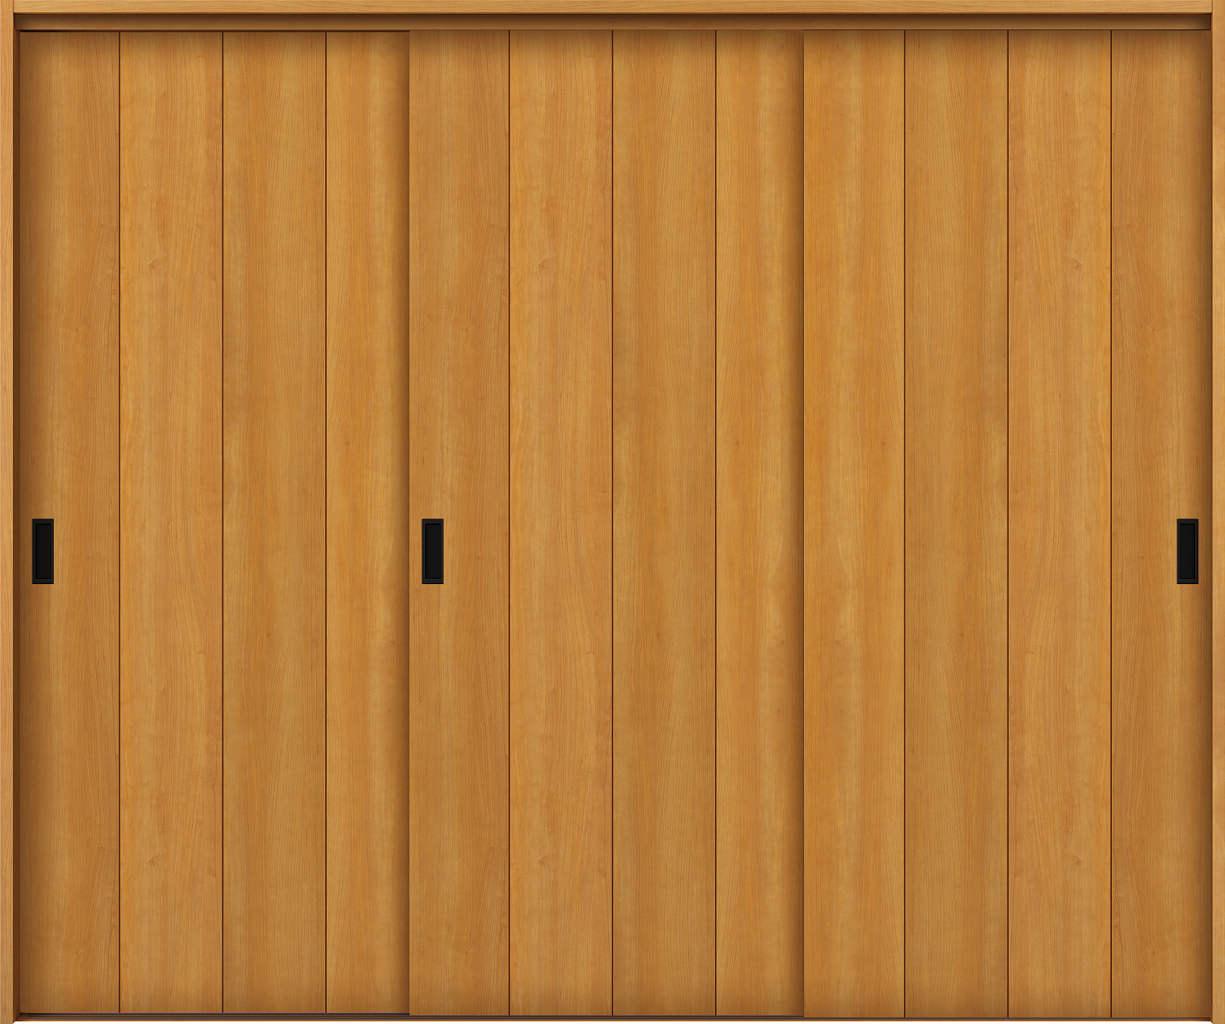 YKKAP室内引戸 ラフォレスタ[スタイリッシュ][木目たて] 3枚引き違い戸 T11 ノンケーシング枠:[幅2433mm×高2033mm]